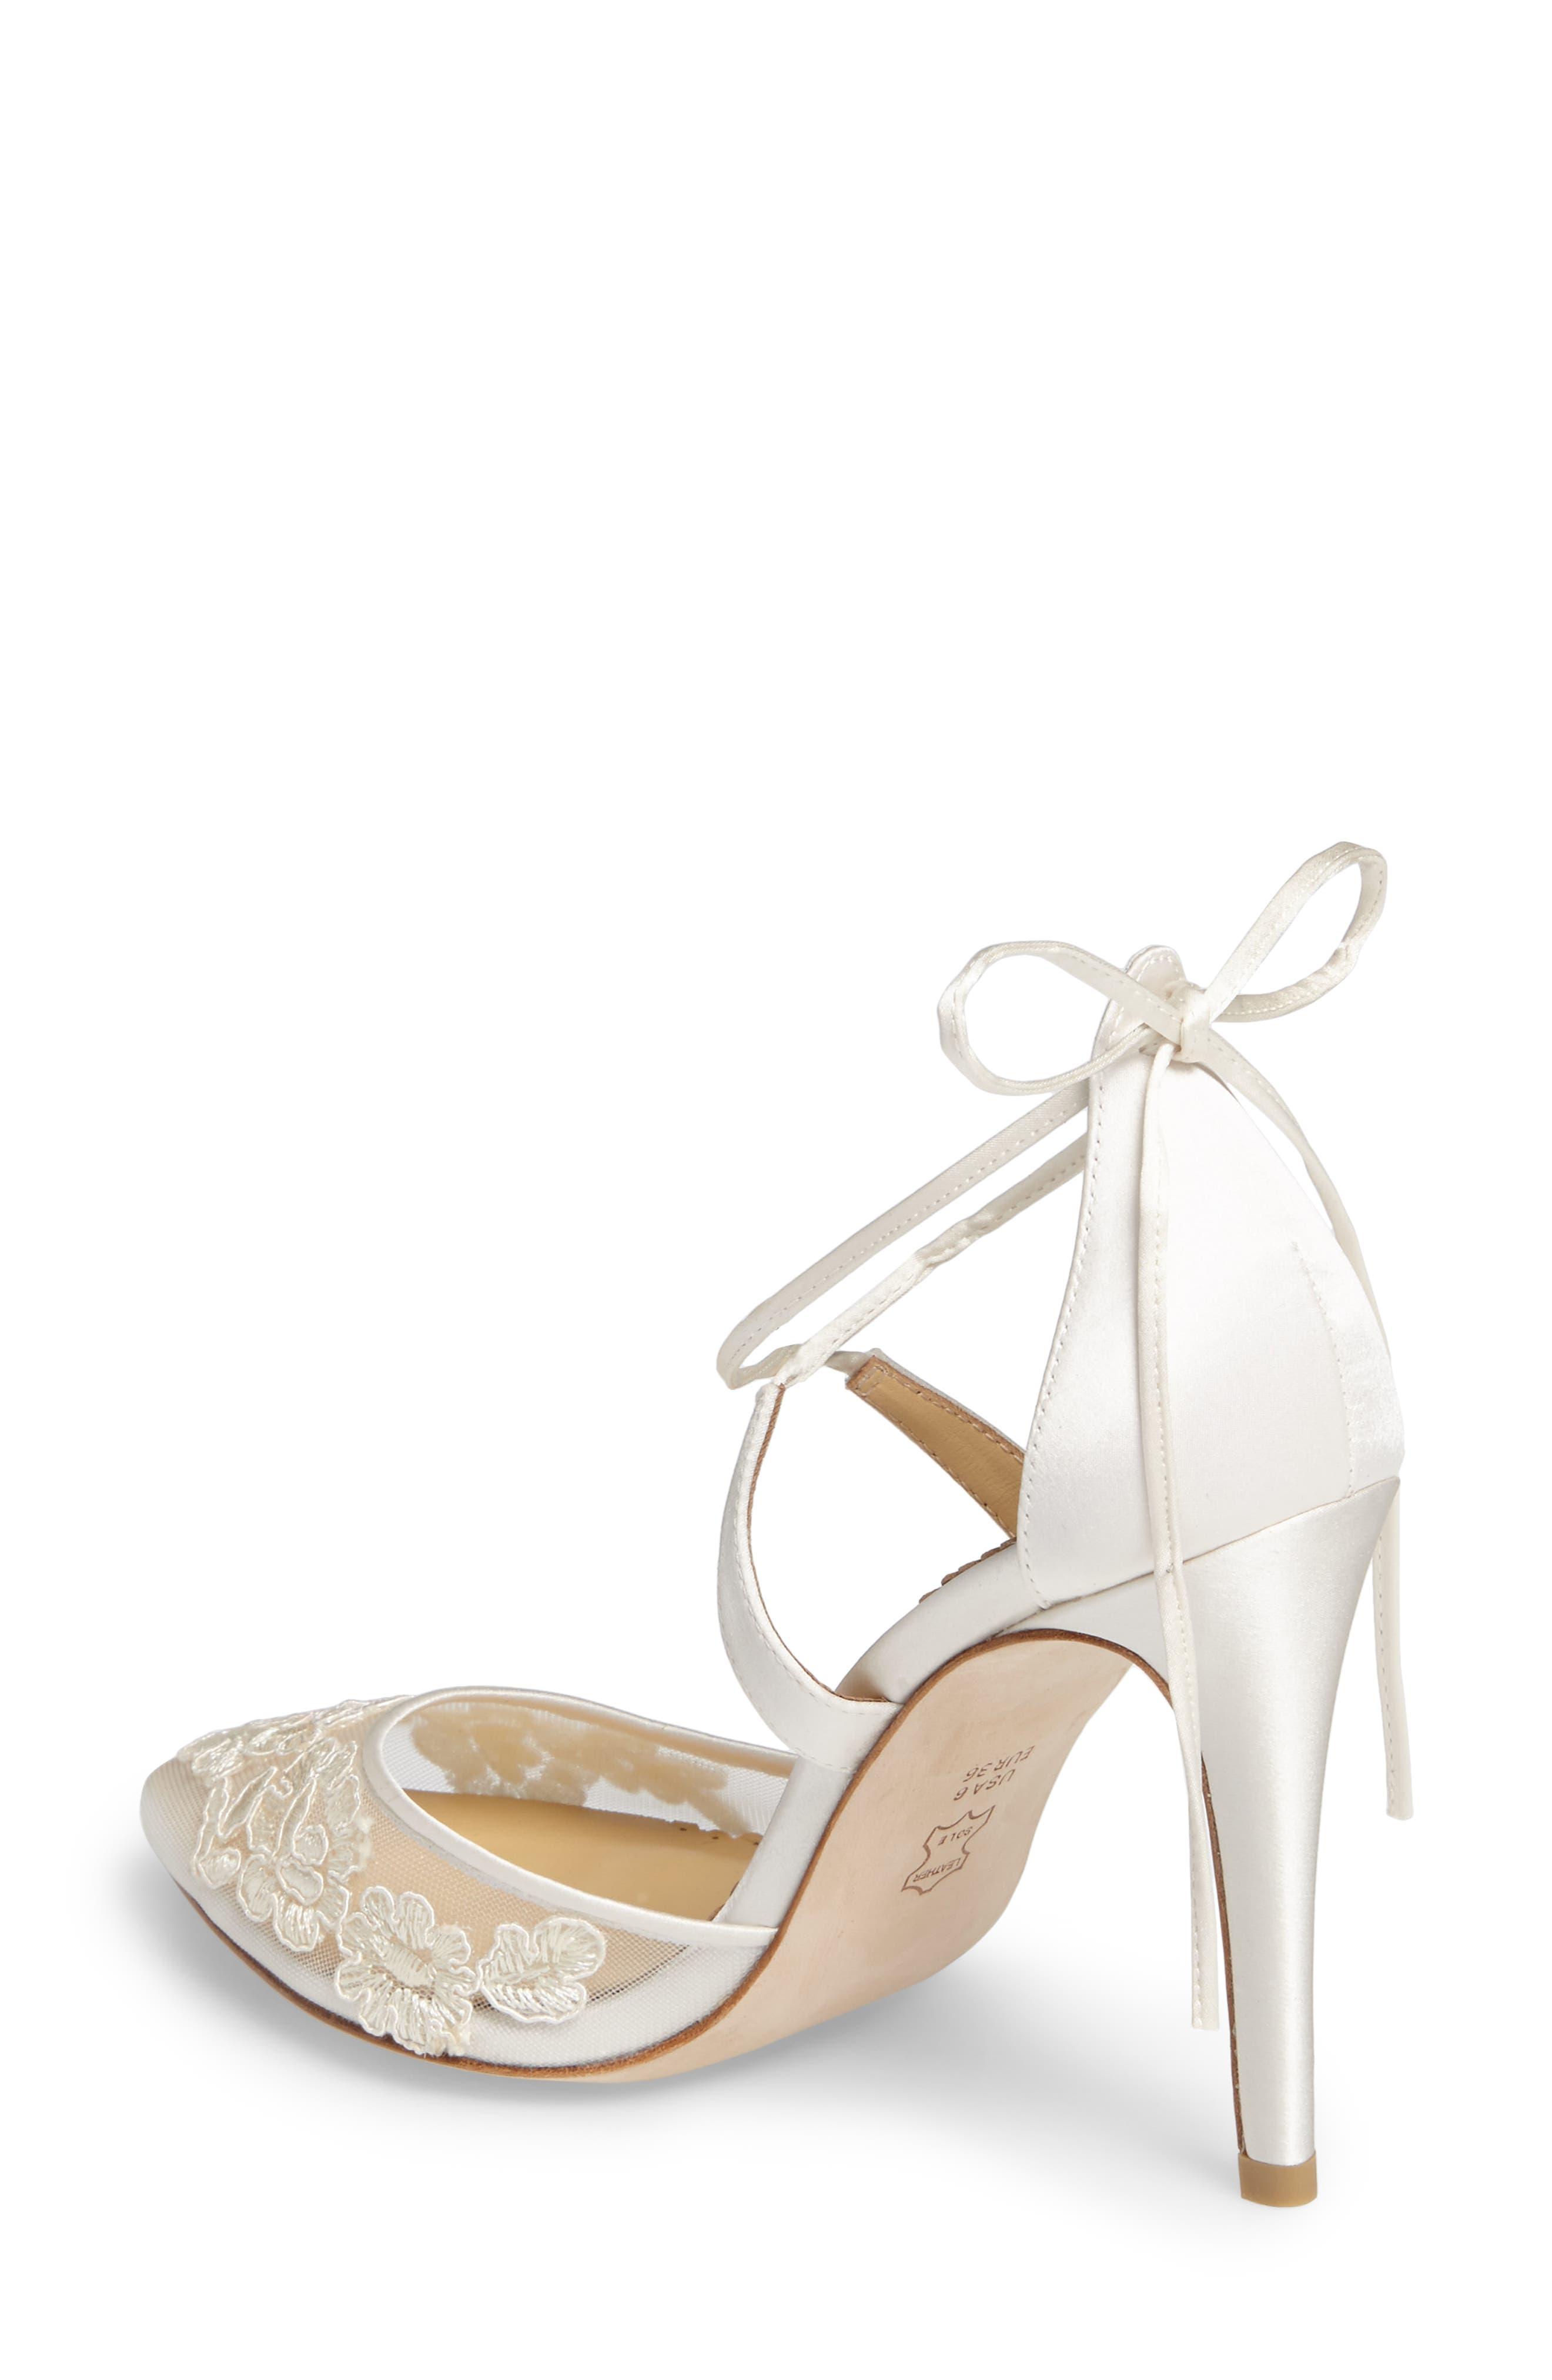 c536d6bebd3d2 Women's Bella Belle Shoes | Nordstrom